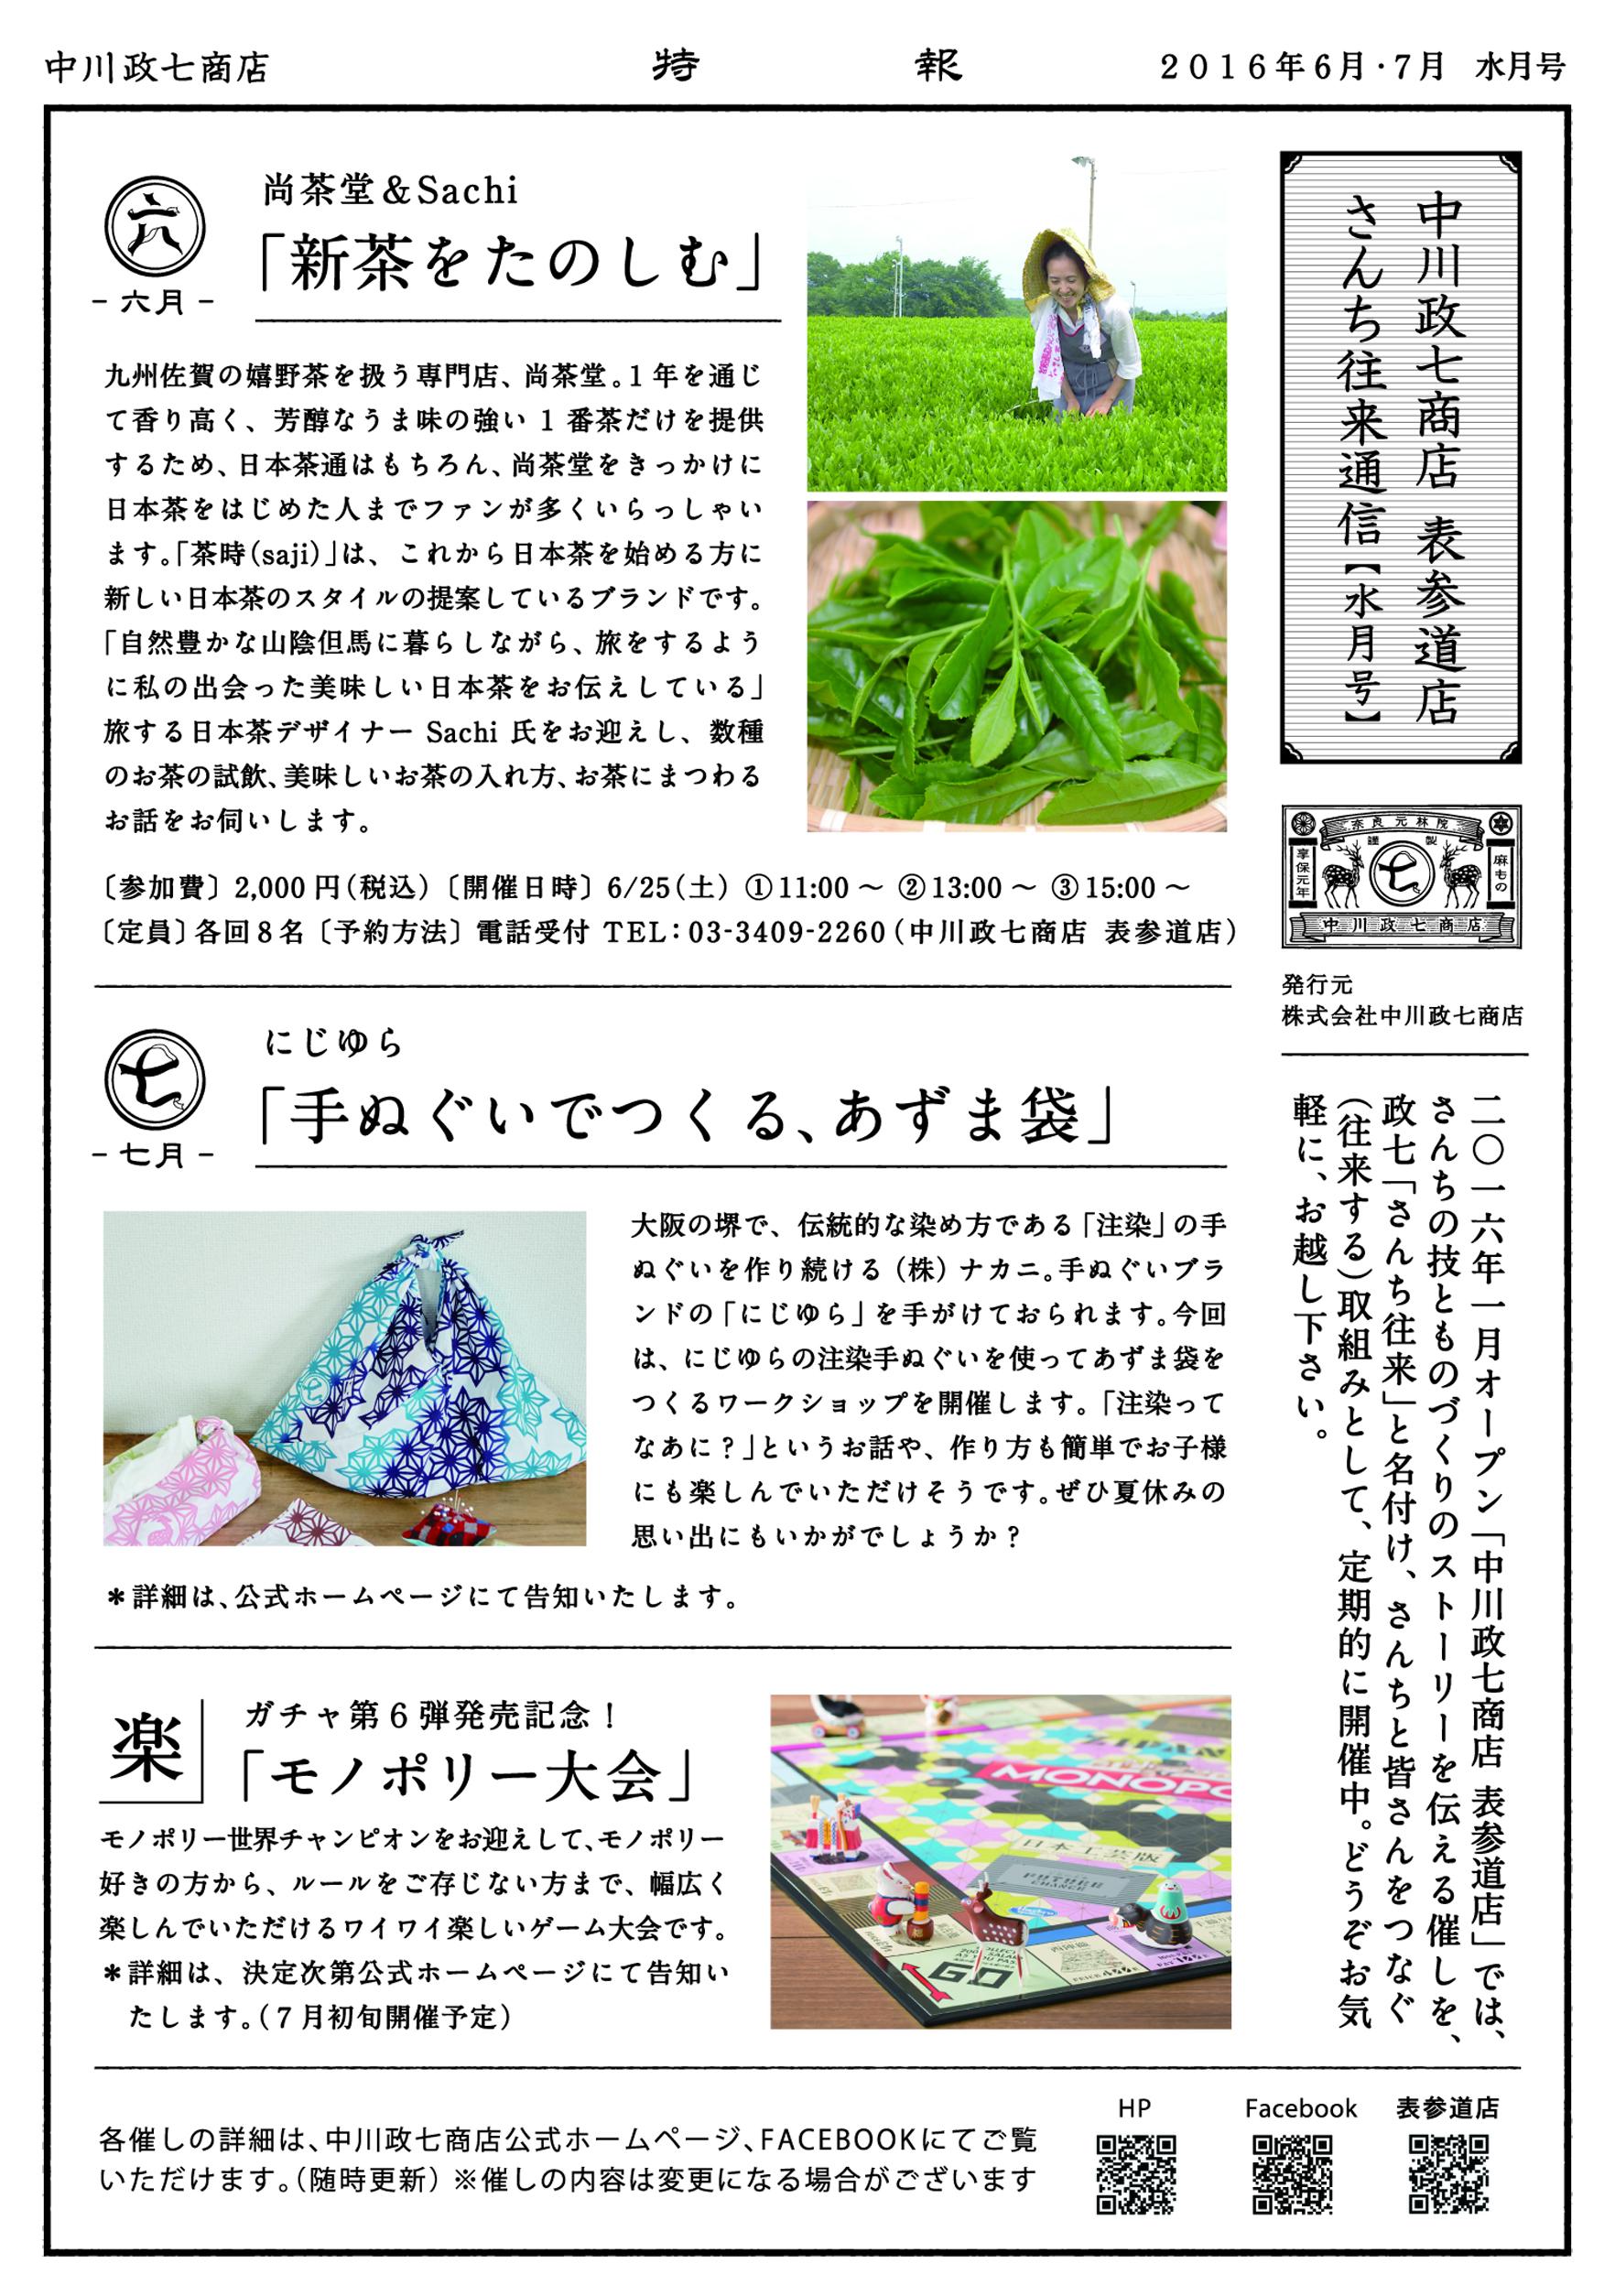 http://ureshinotea.com/news/assets_c/2016/06/sanchidayori-thumb-1764x2508-179.jpg